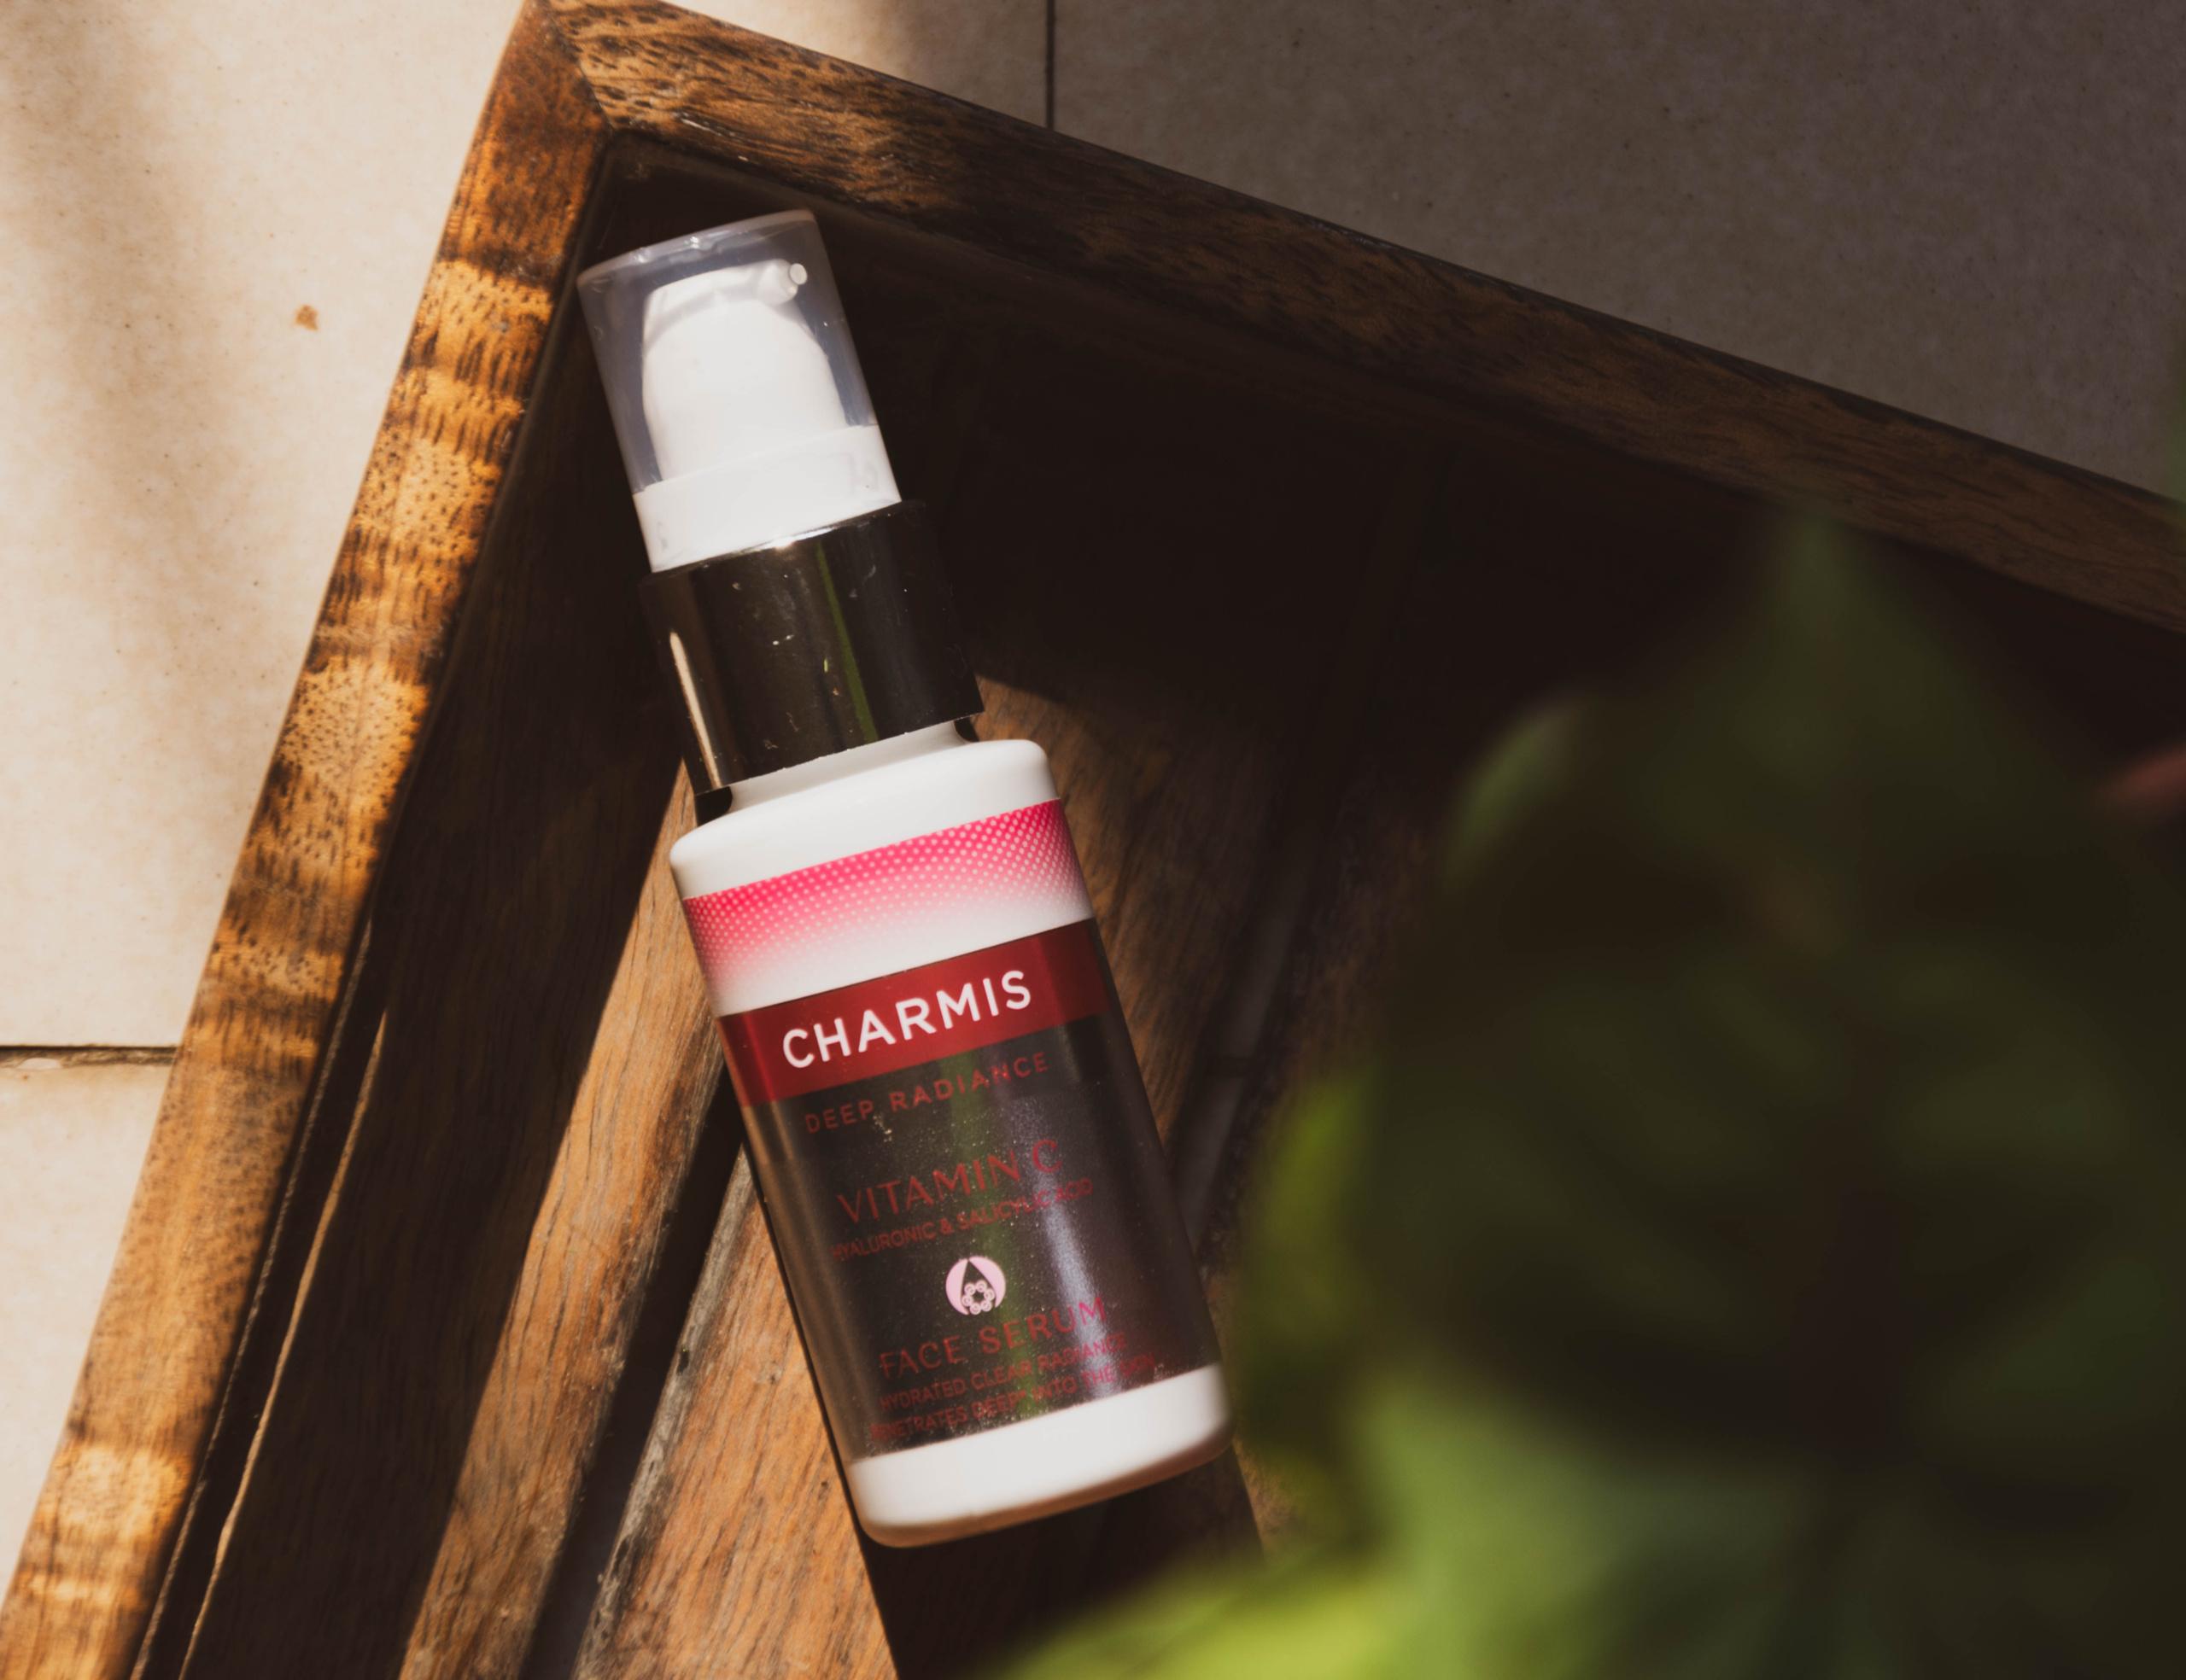 Charmis Deep Radiance Vitamin C Face Serum Review